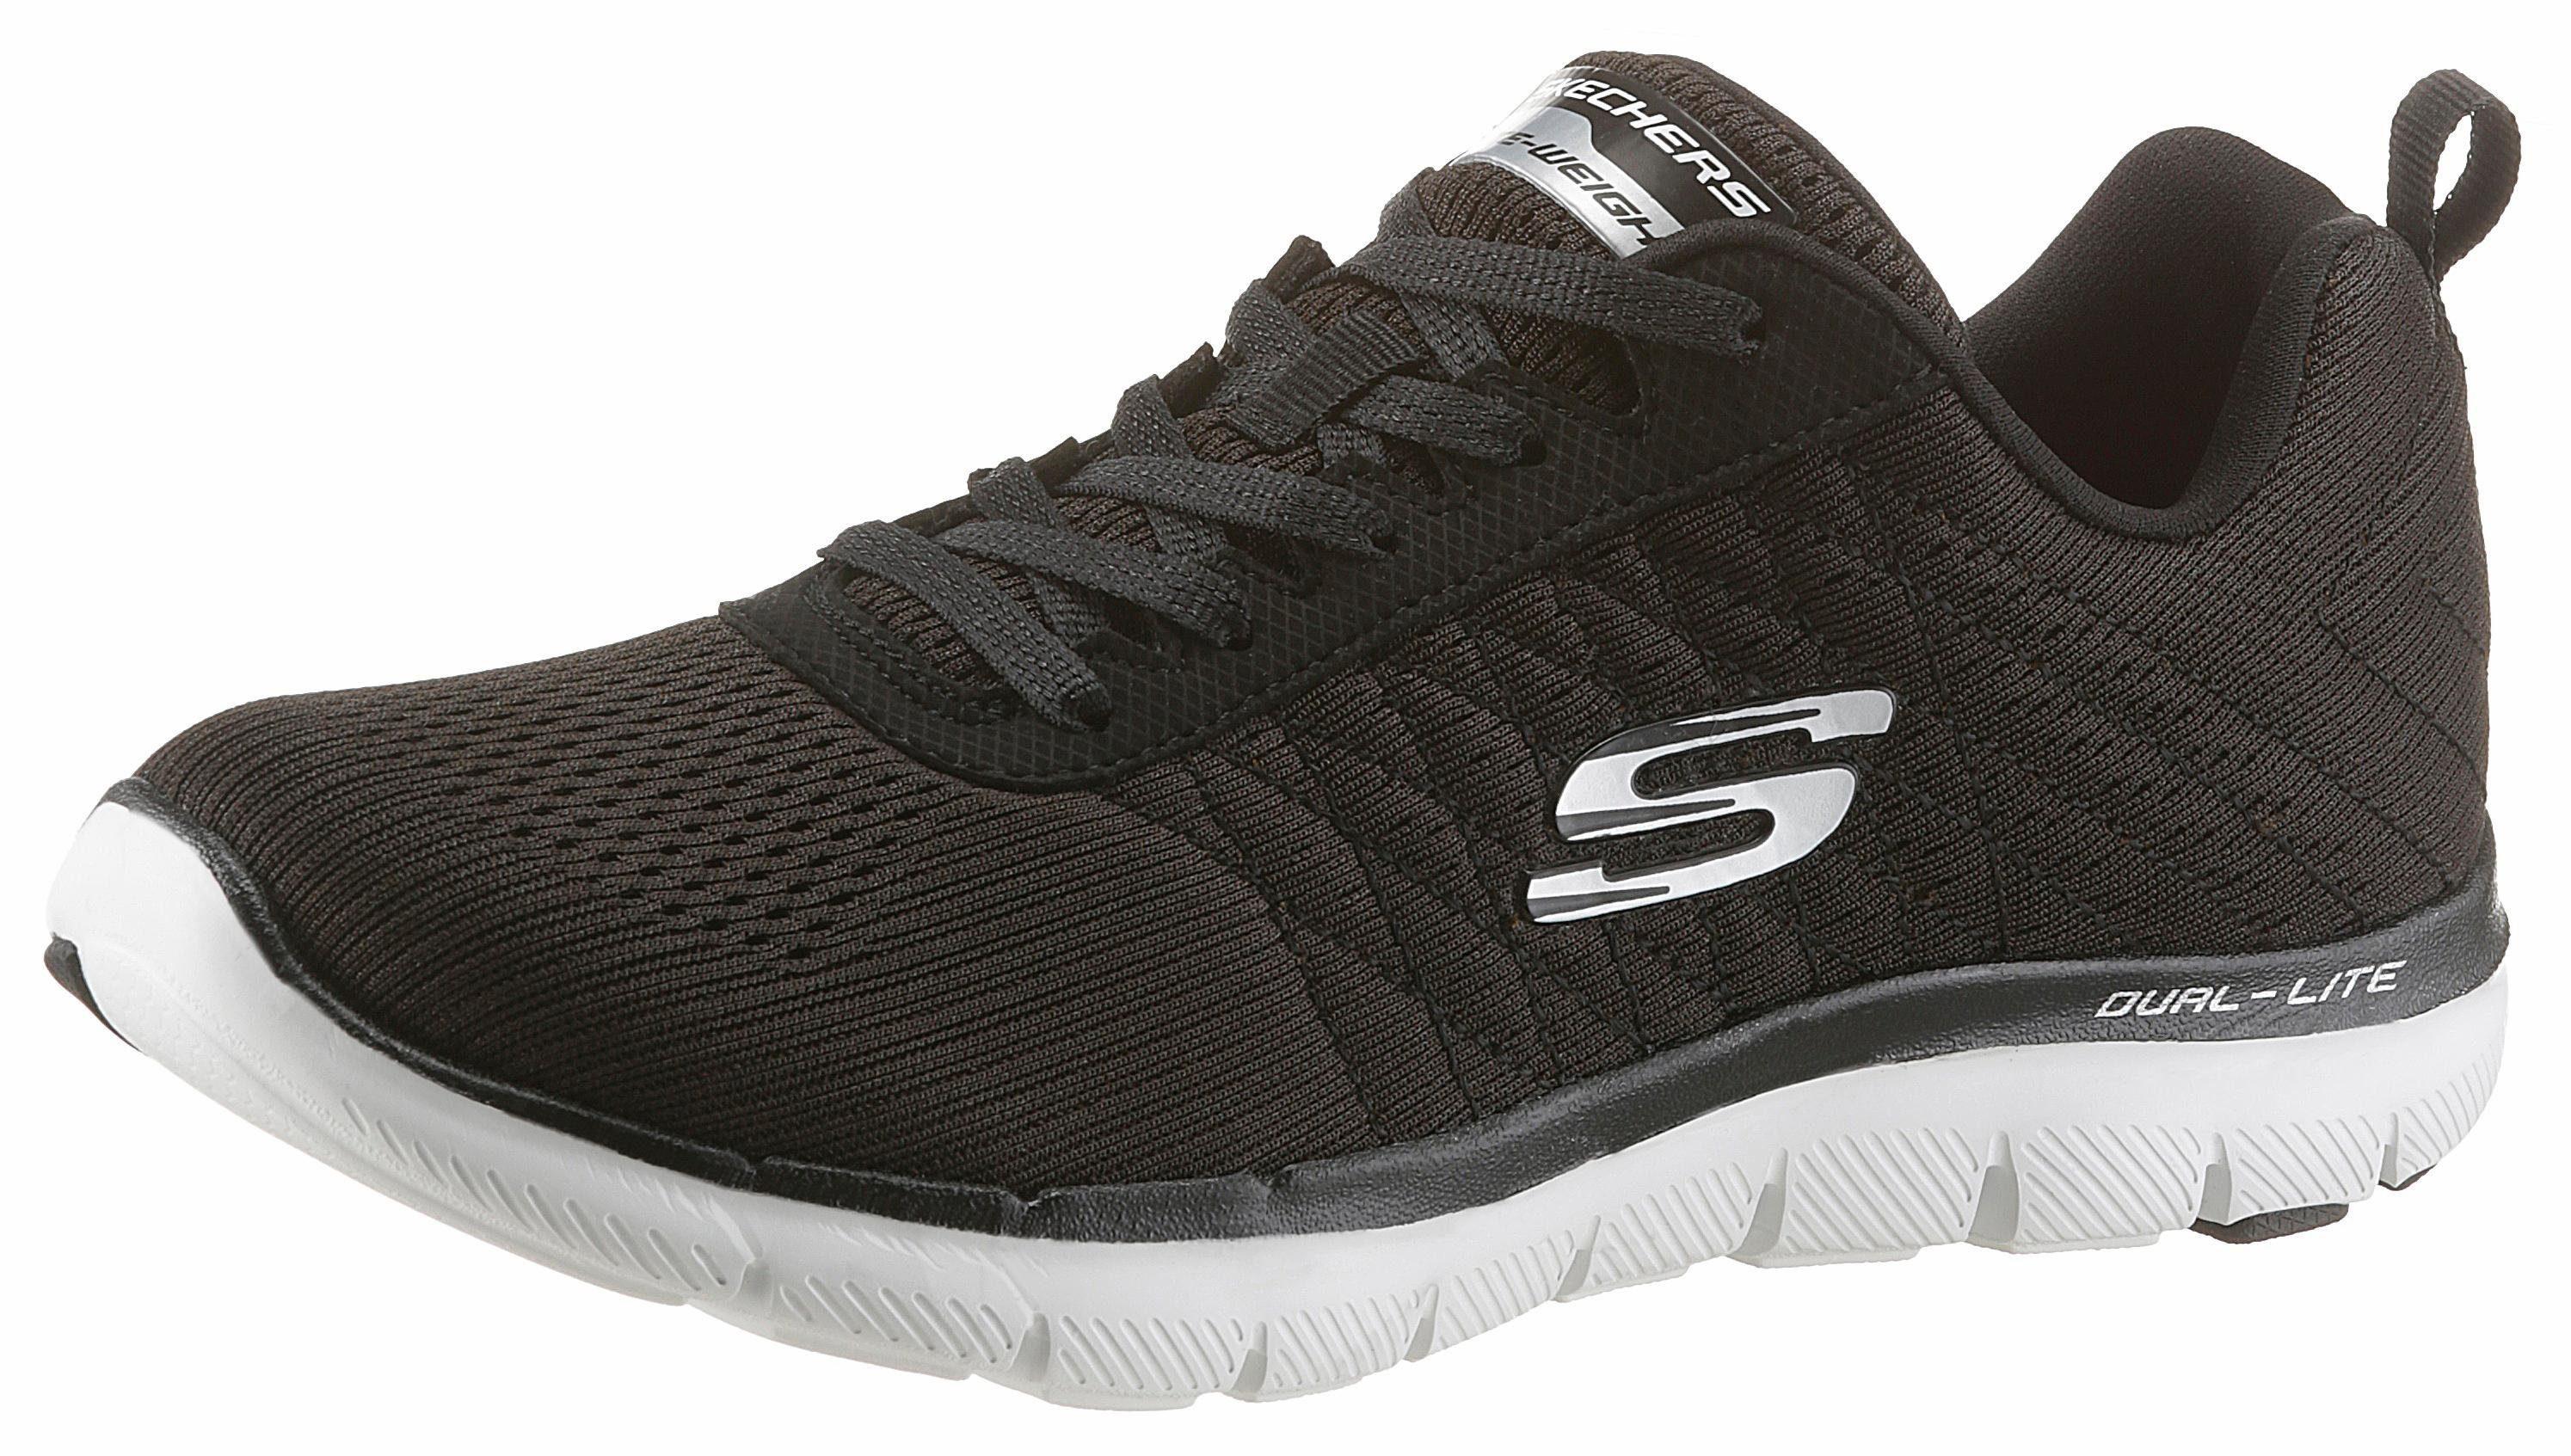 Skechers »Flex Appeal 2.0 Break Free« Sneaker, mit Dämpfung durch Air Cooled Memory Foam, grau, anthrazit